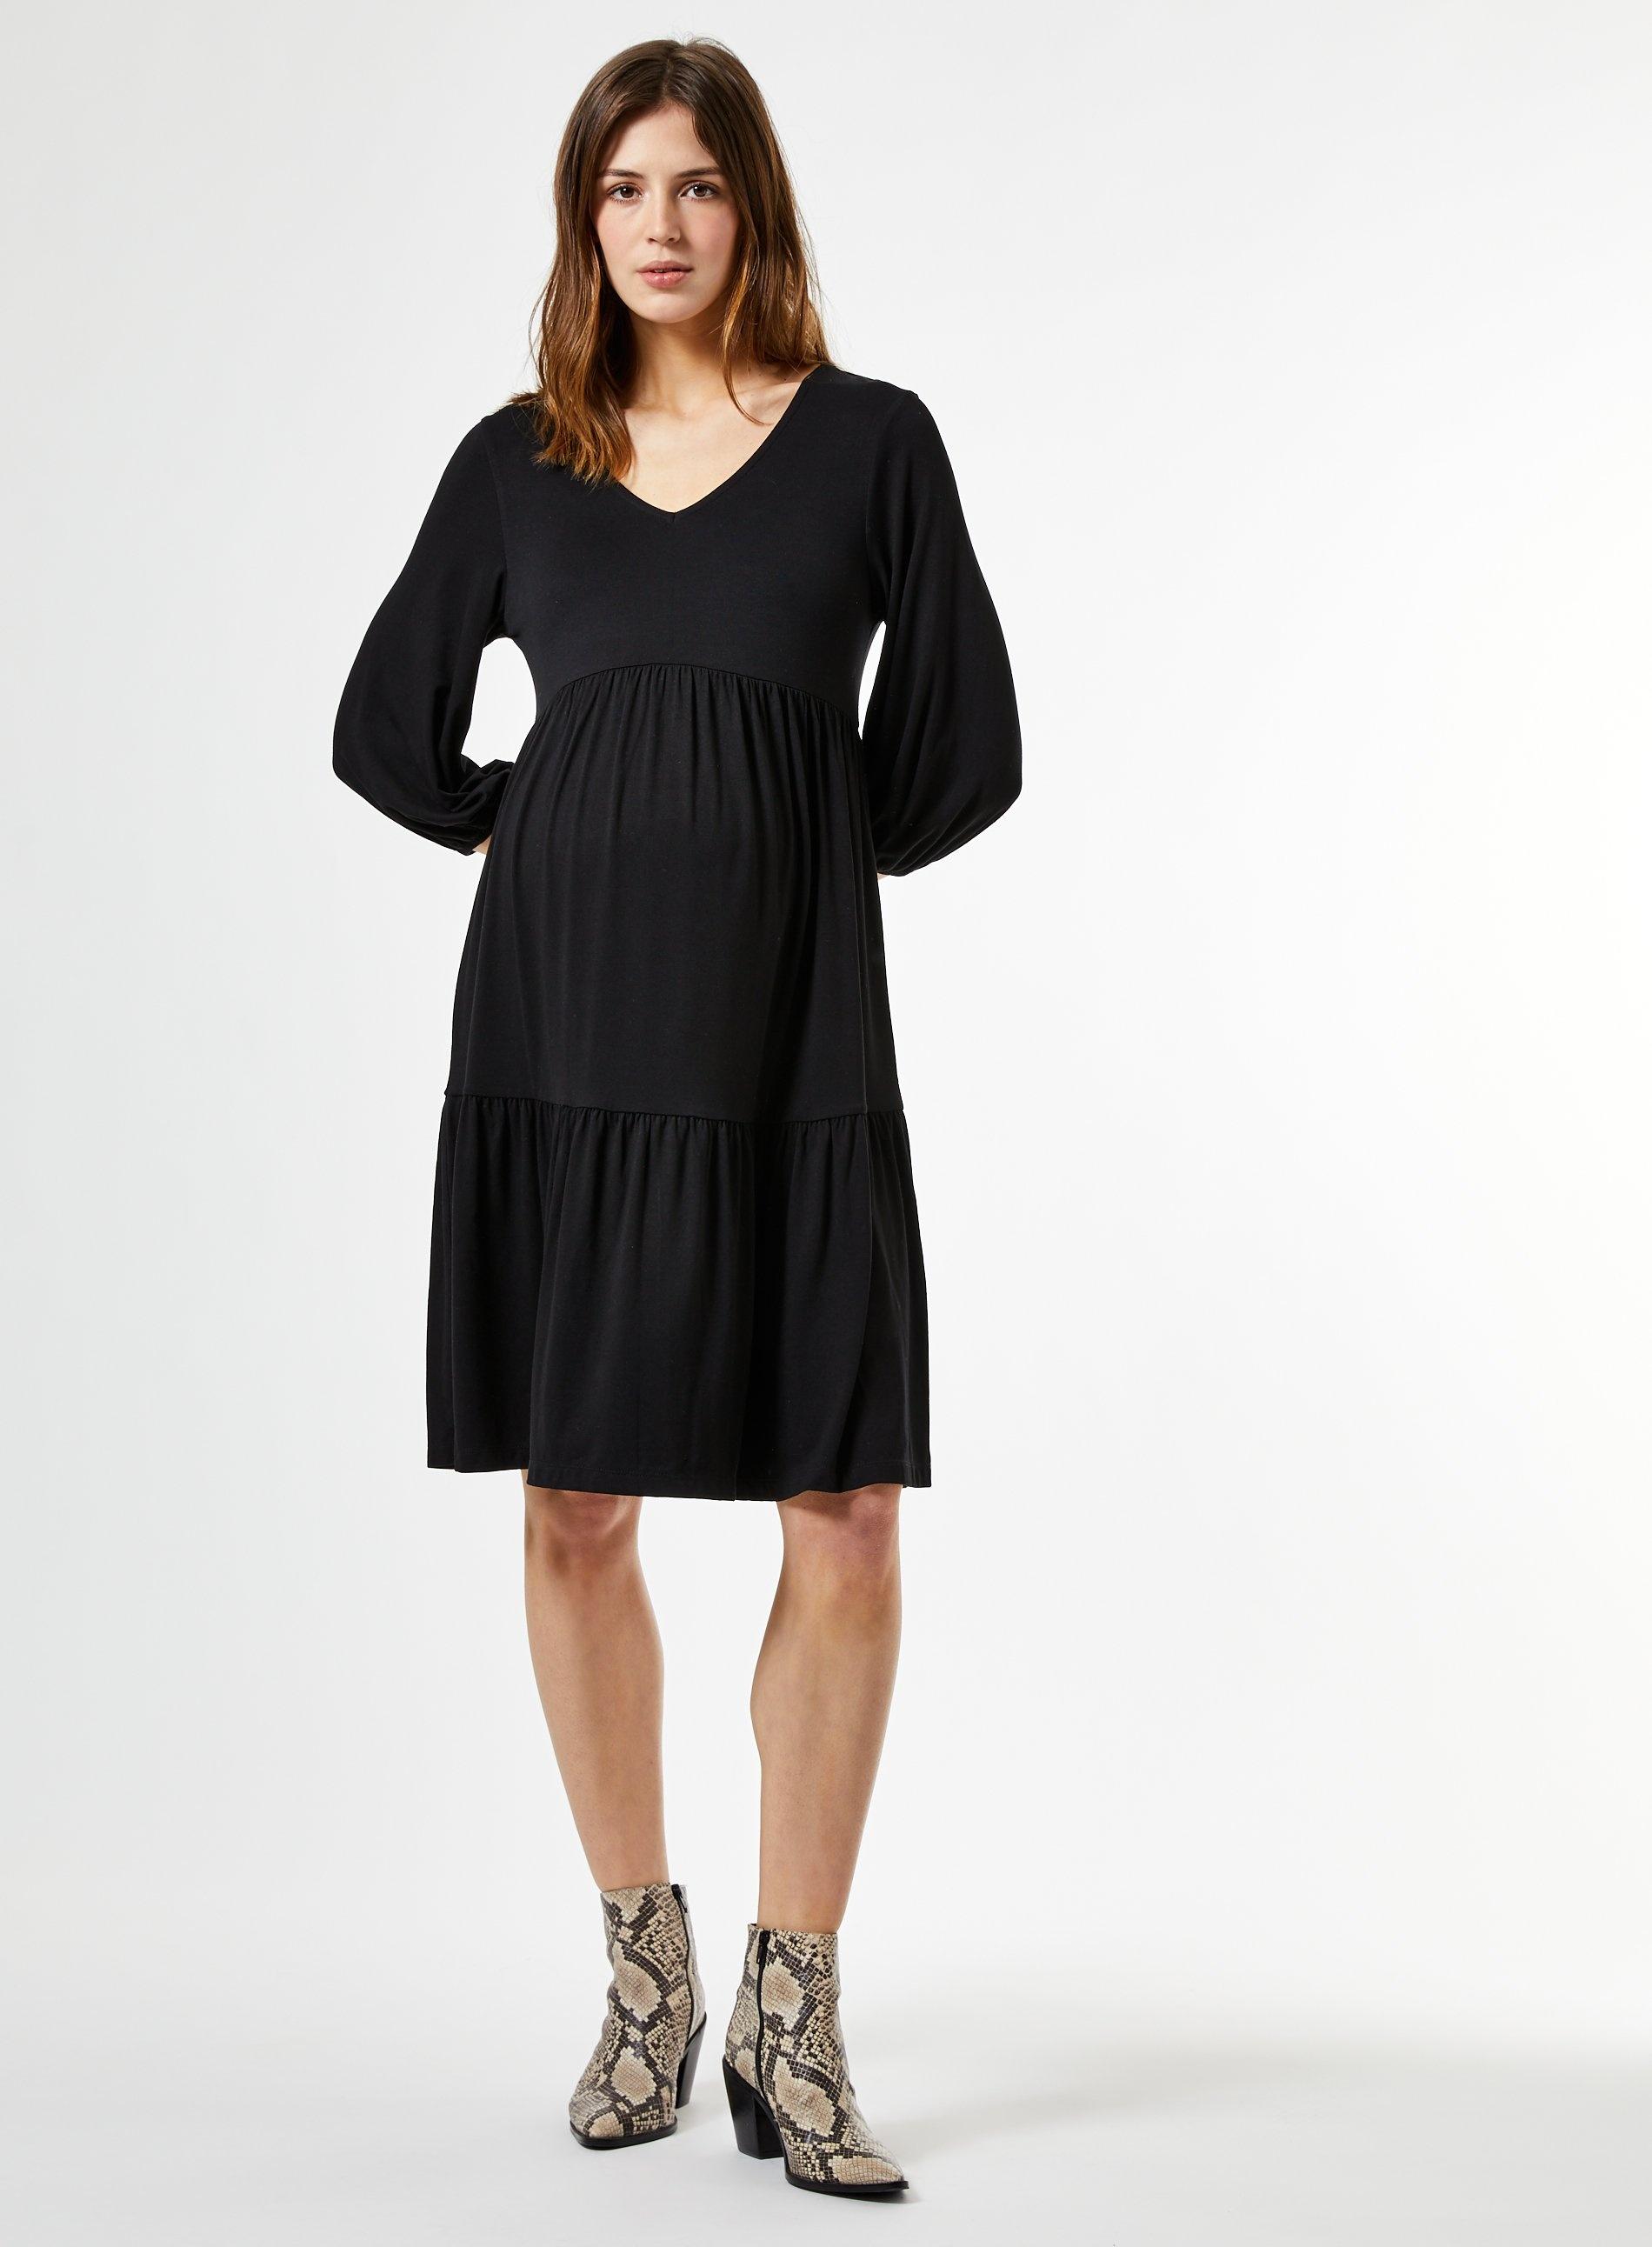 Maternity Lace 3/4 Sleeve Stretch Bodycon Pregnancy Midi